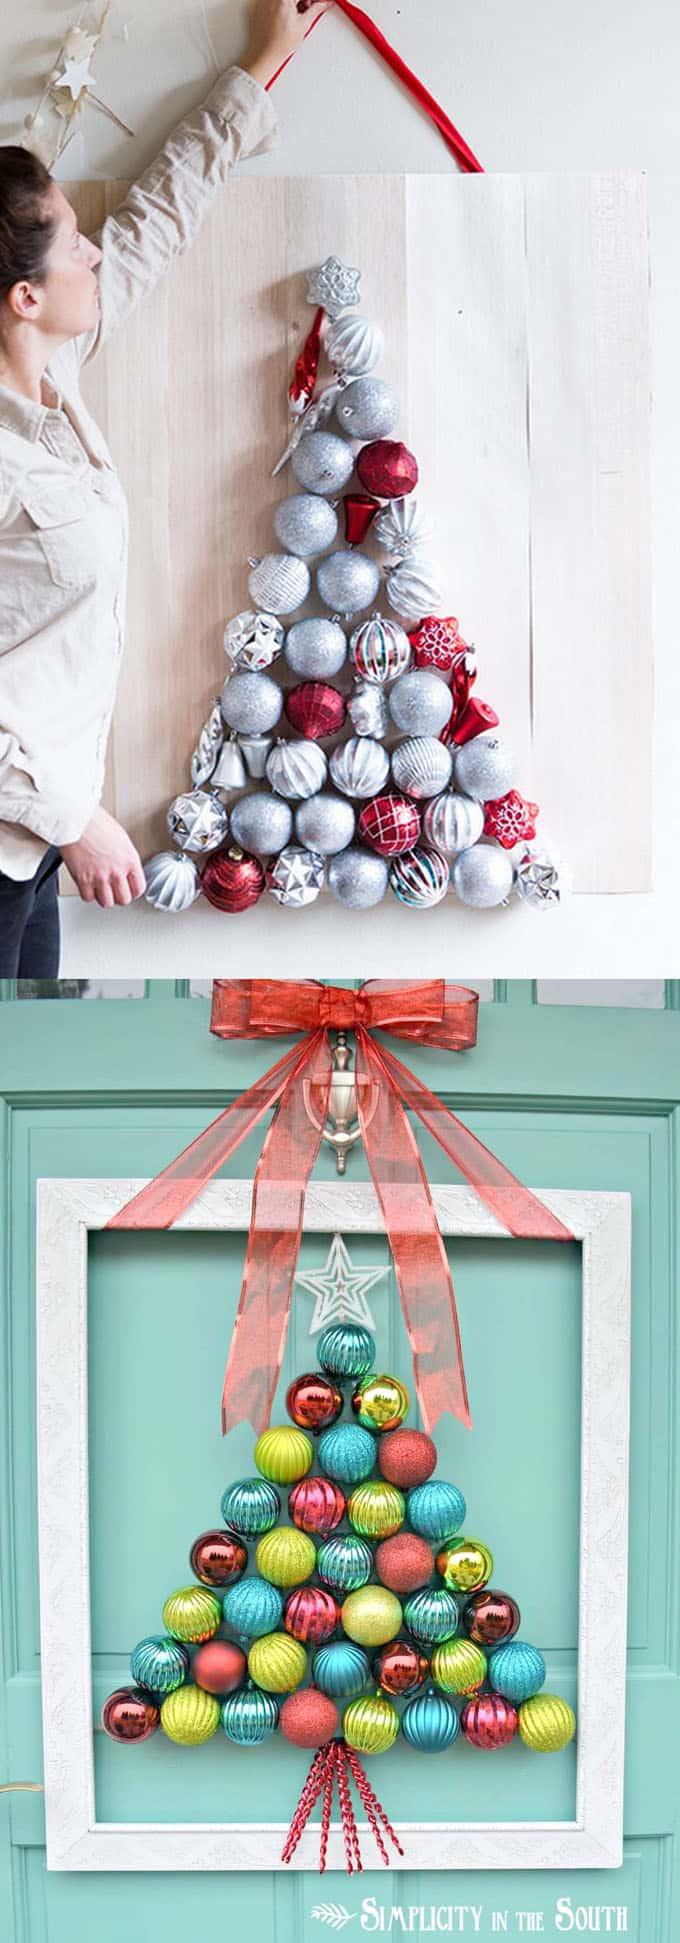 diy christmas tree ideas apieceofrainbow 3 - 48 Amazing Alternative Christmas Tree Ideas